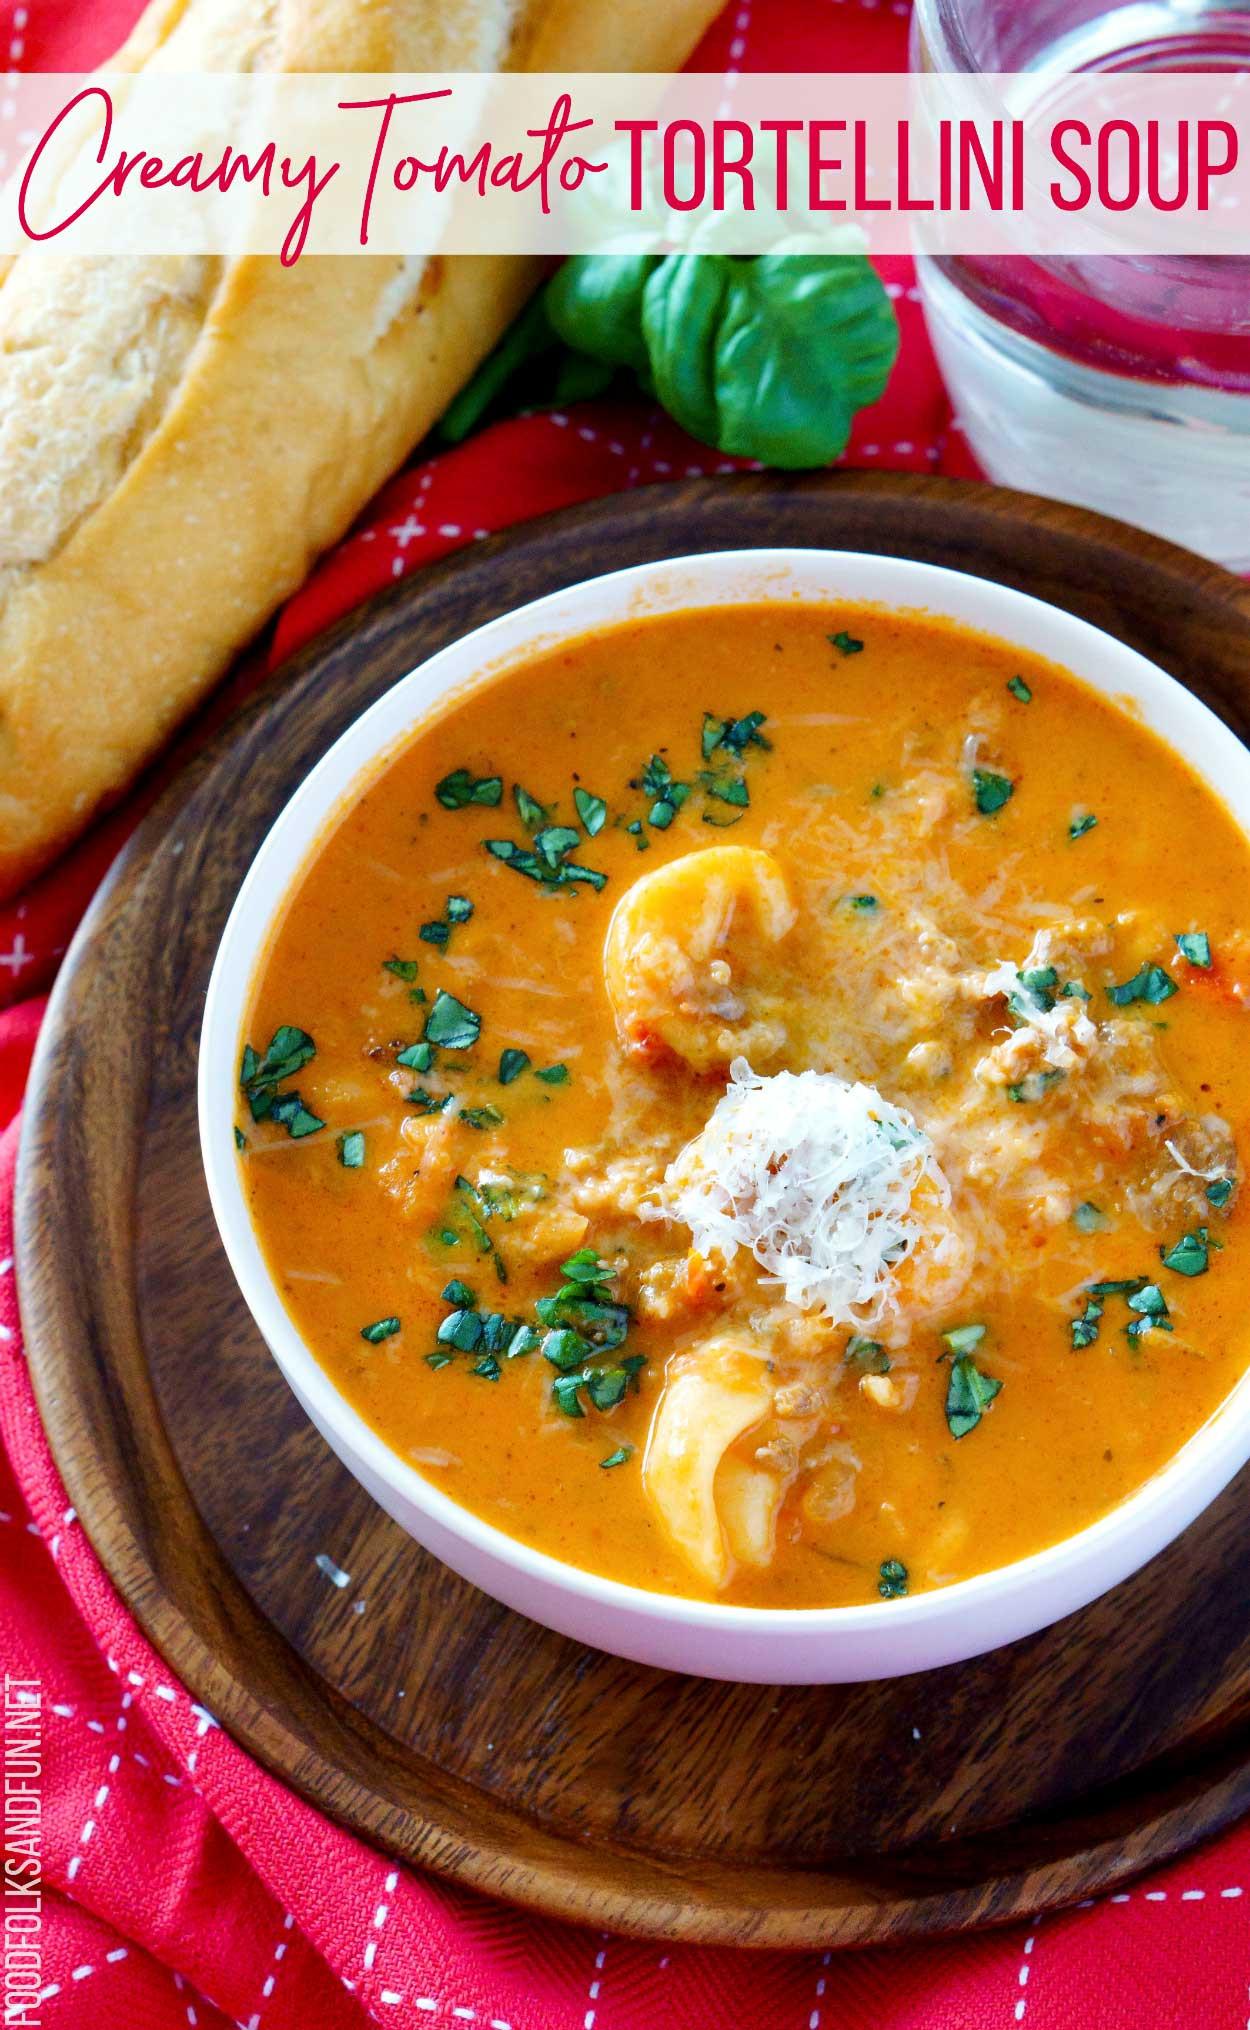 Tomato Tortellini Soup  Creamy Tomato Tortellini Soup • Food Folks and Fun